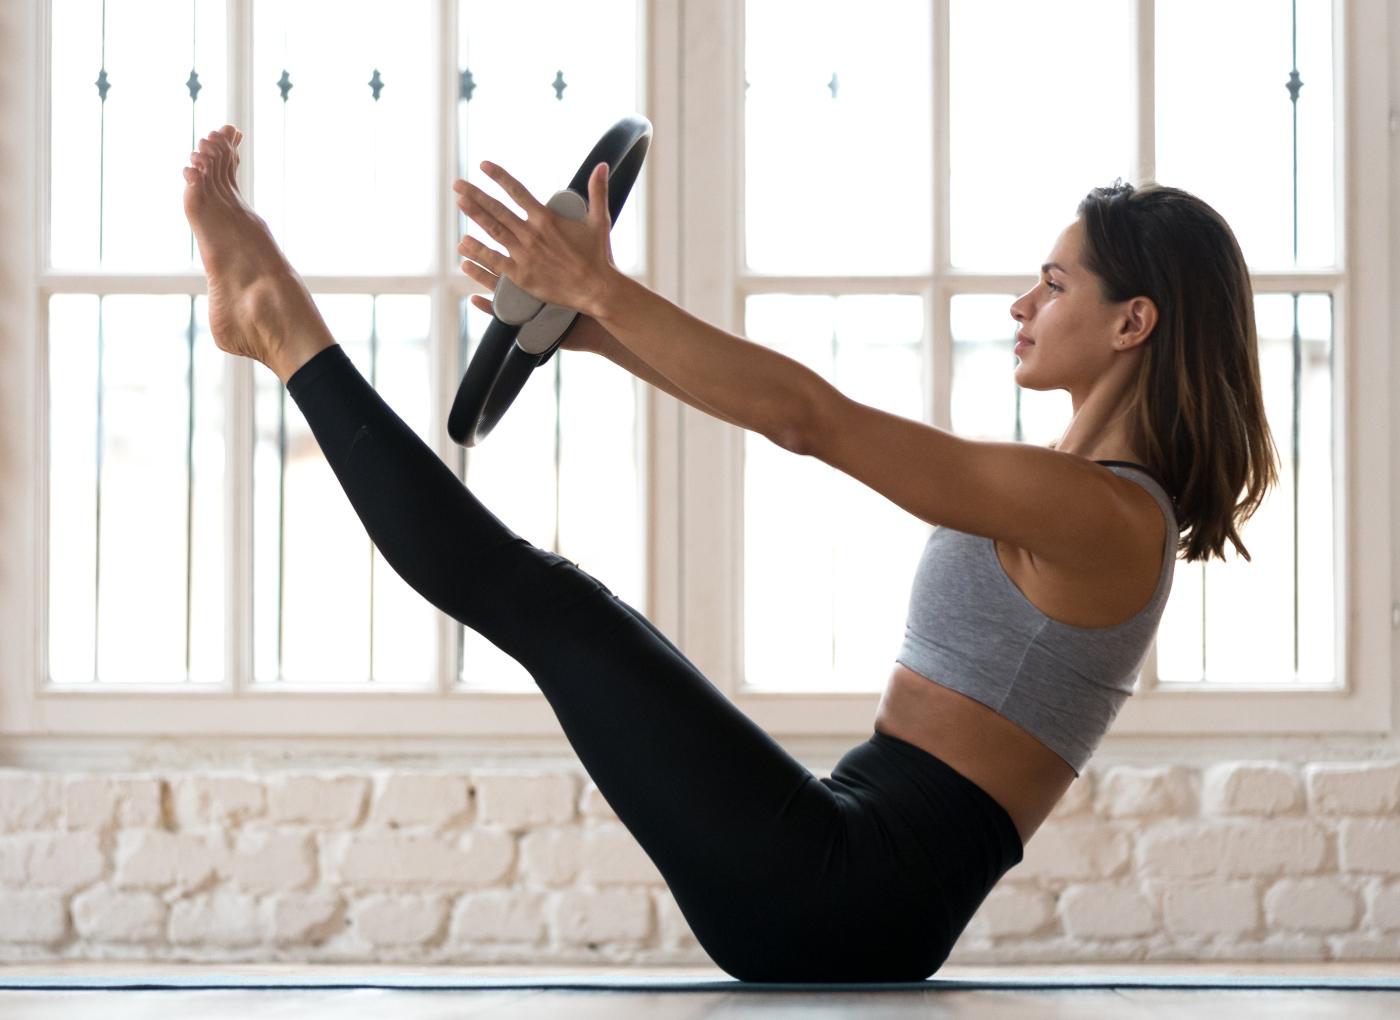 Exercícios para o core: abdominal isométrico